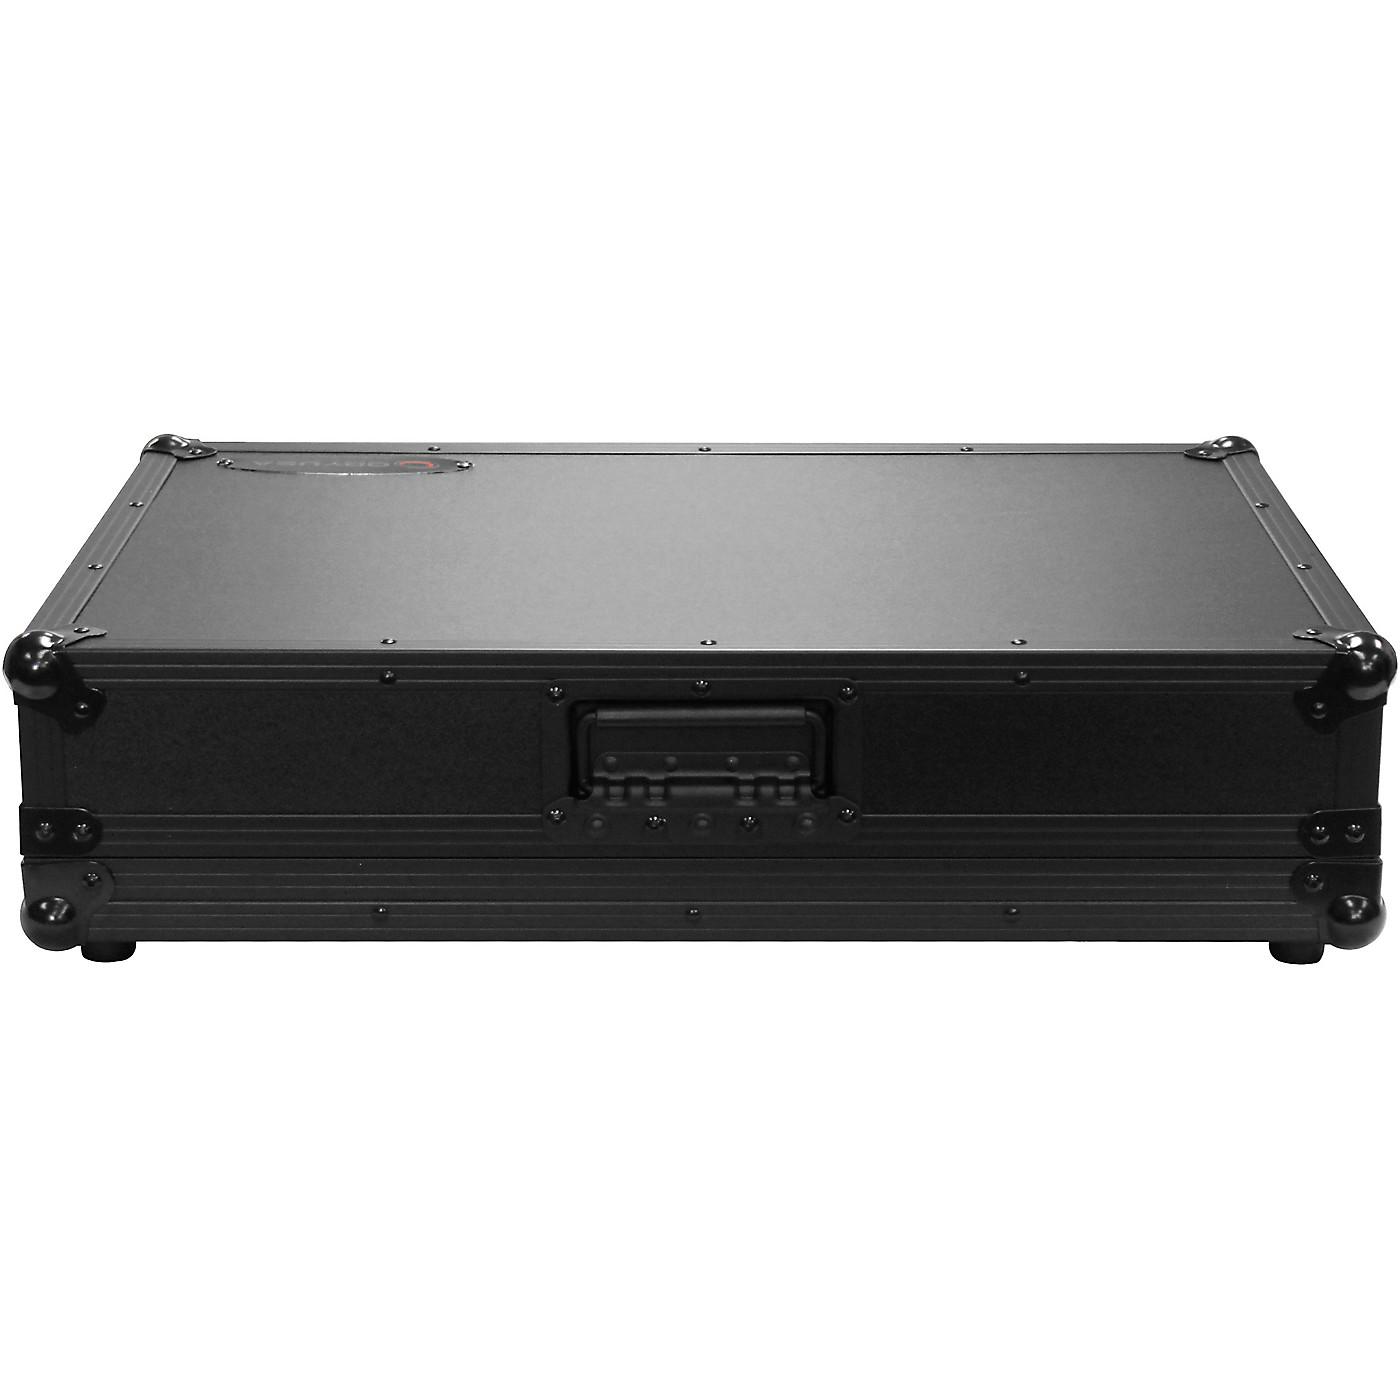 Odyssey FRGSPIDDJRRBL Black Label Low Profile Glide Style Pioneer DDJ-RR / DDJ-SR DJ Controller Case thumbnail